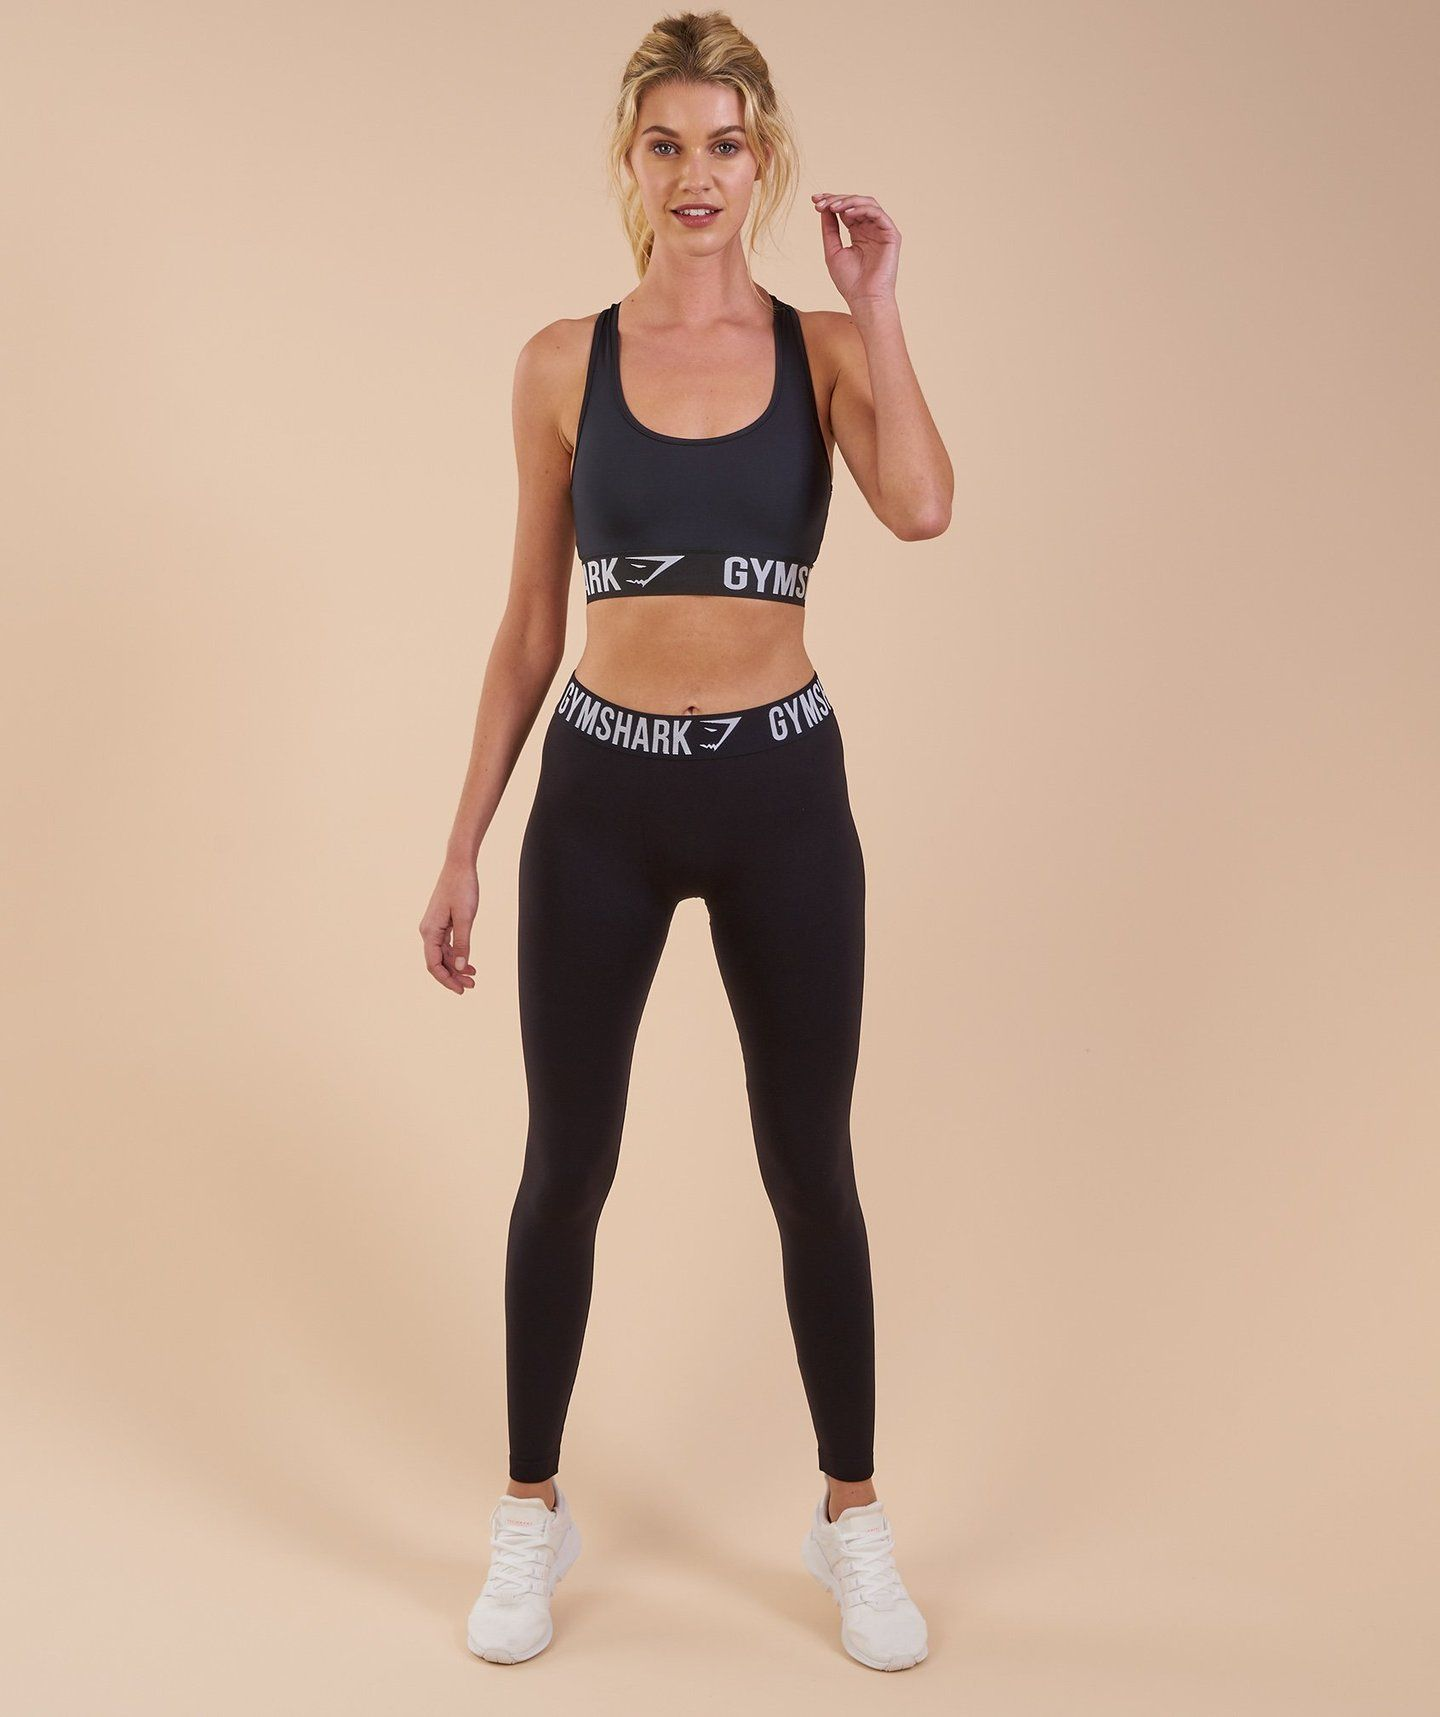 0b11fb5eefa1f4 Gymshark Fit Leggings - Black/White | lounge/activewear | Workout ...